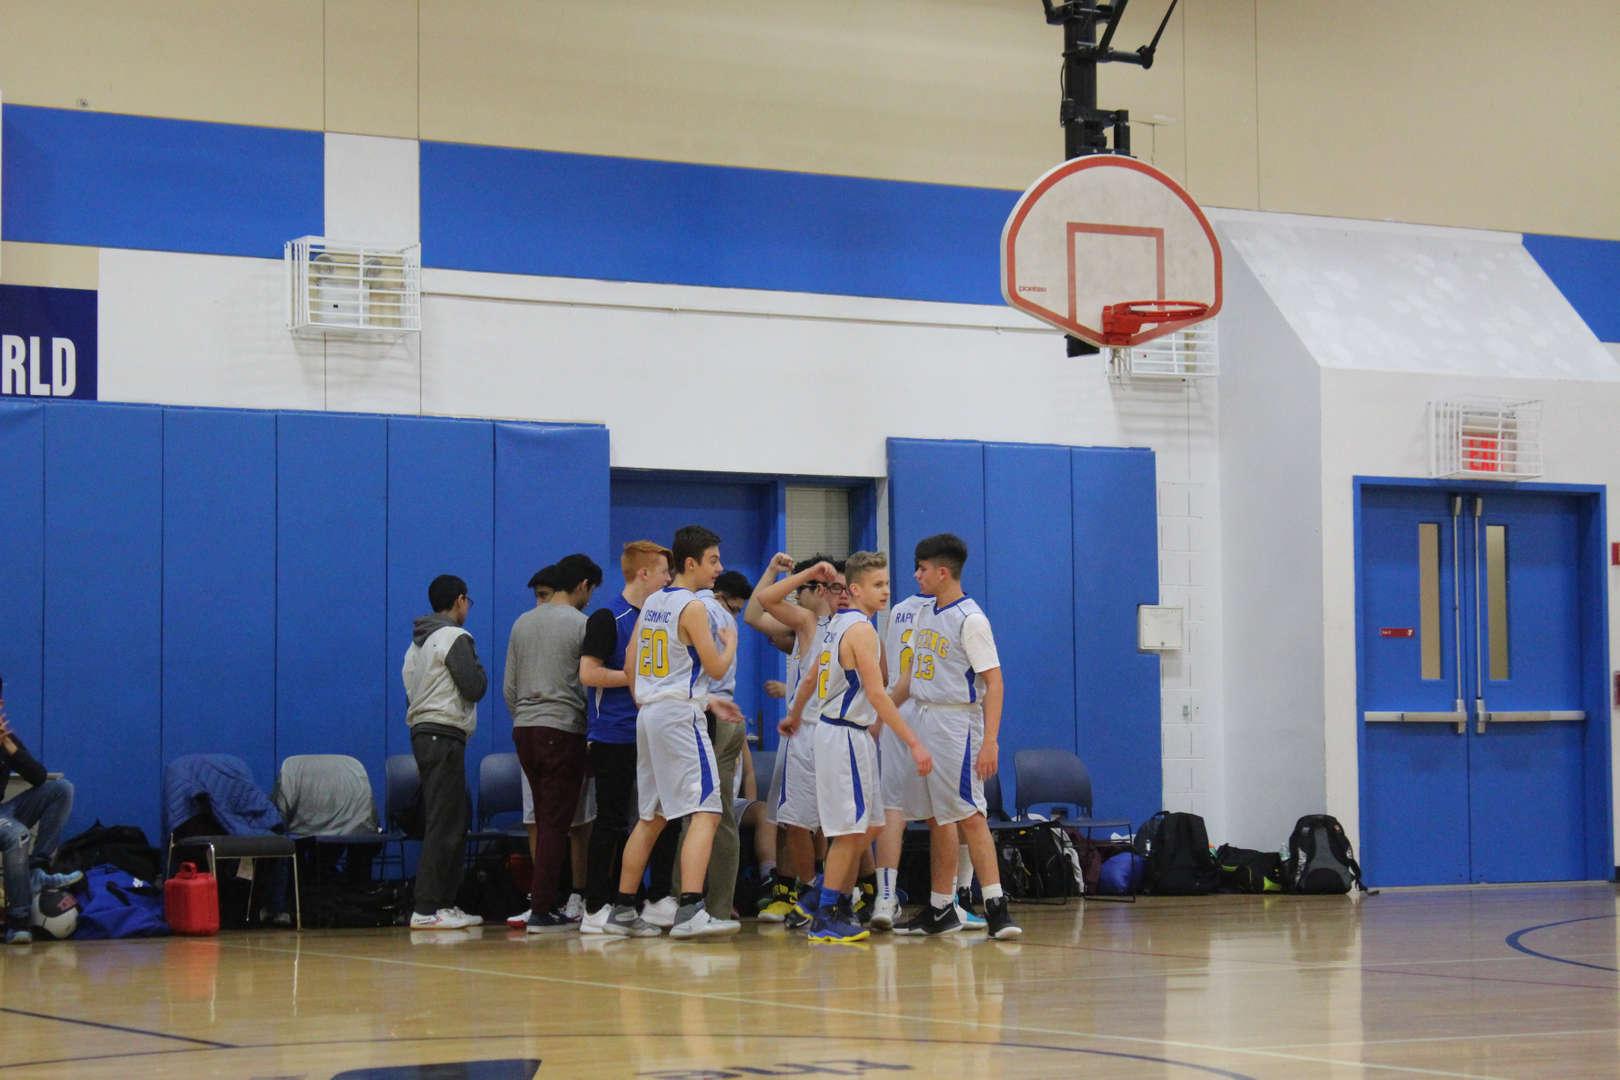 BSGE basketball team huddles on the sidelines